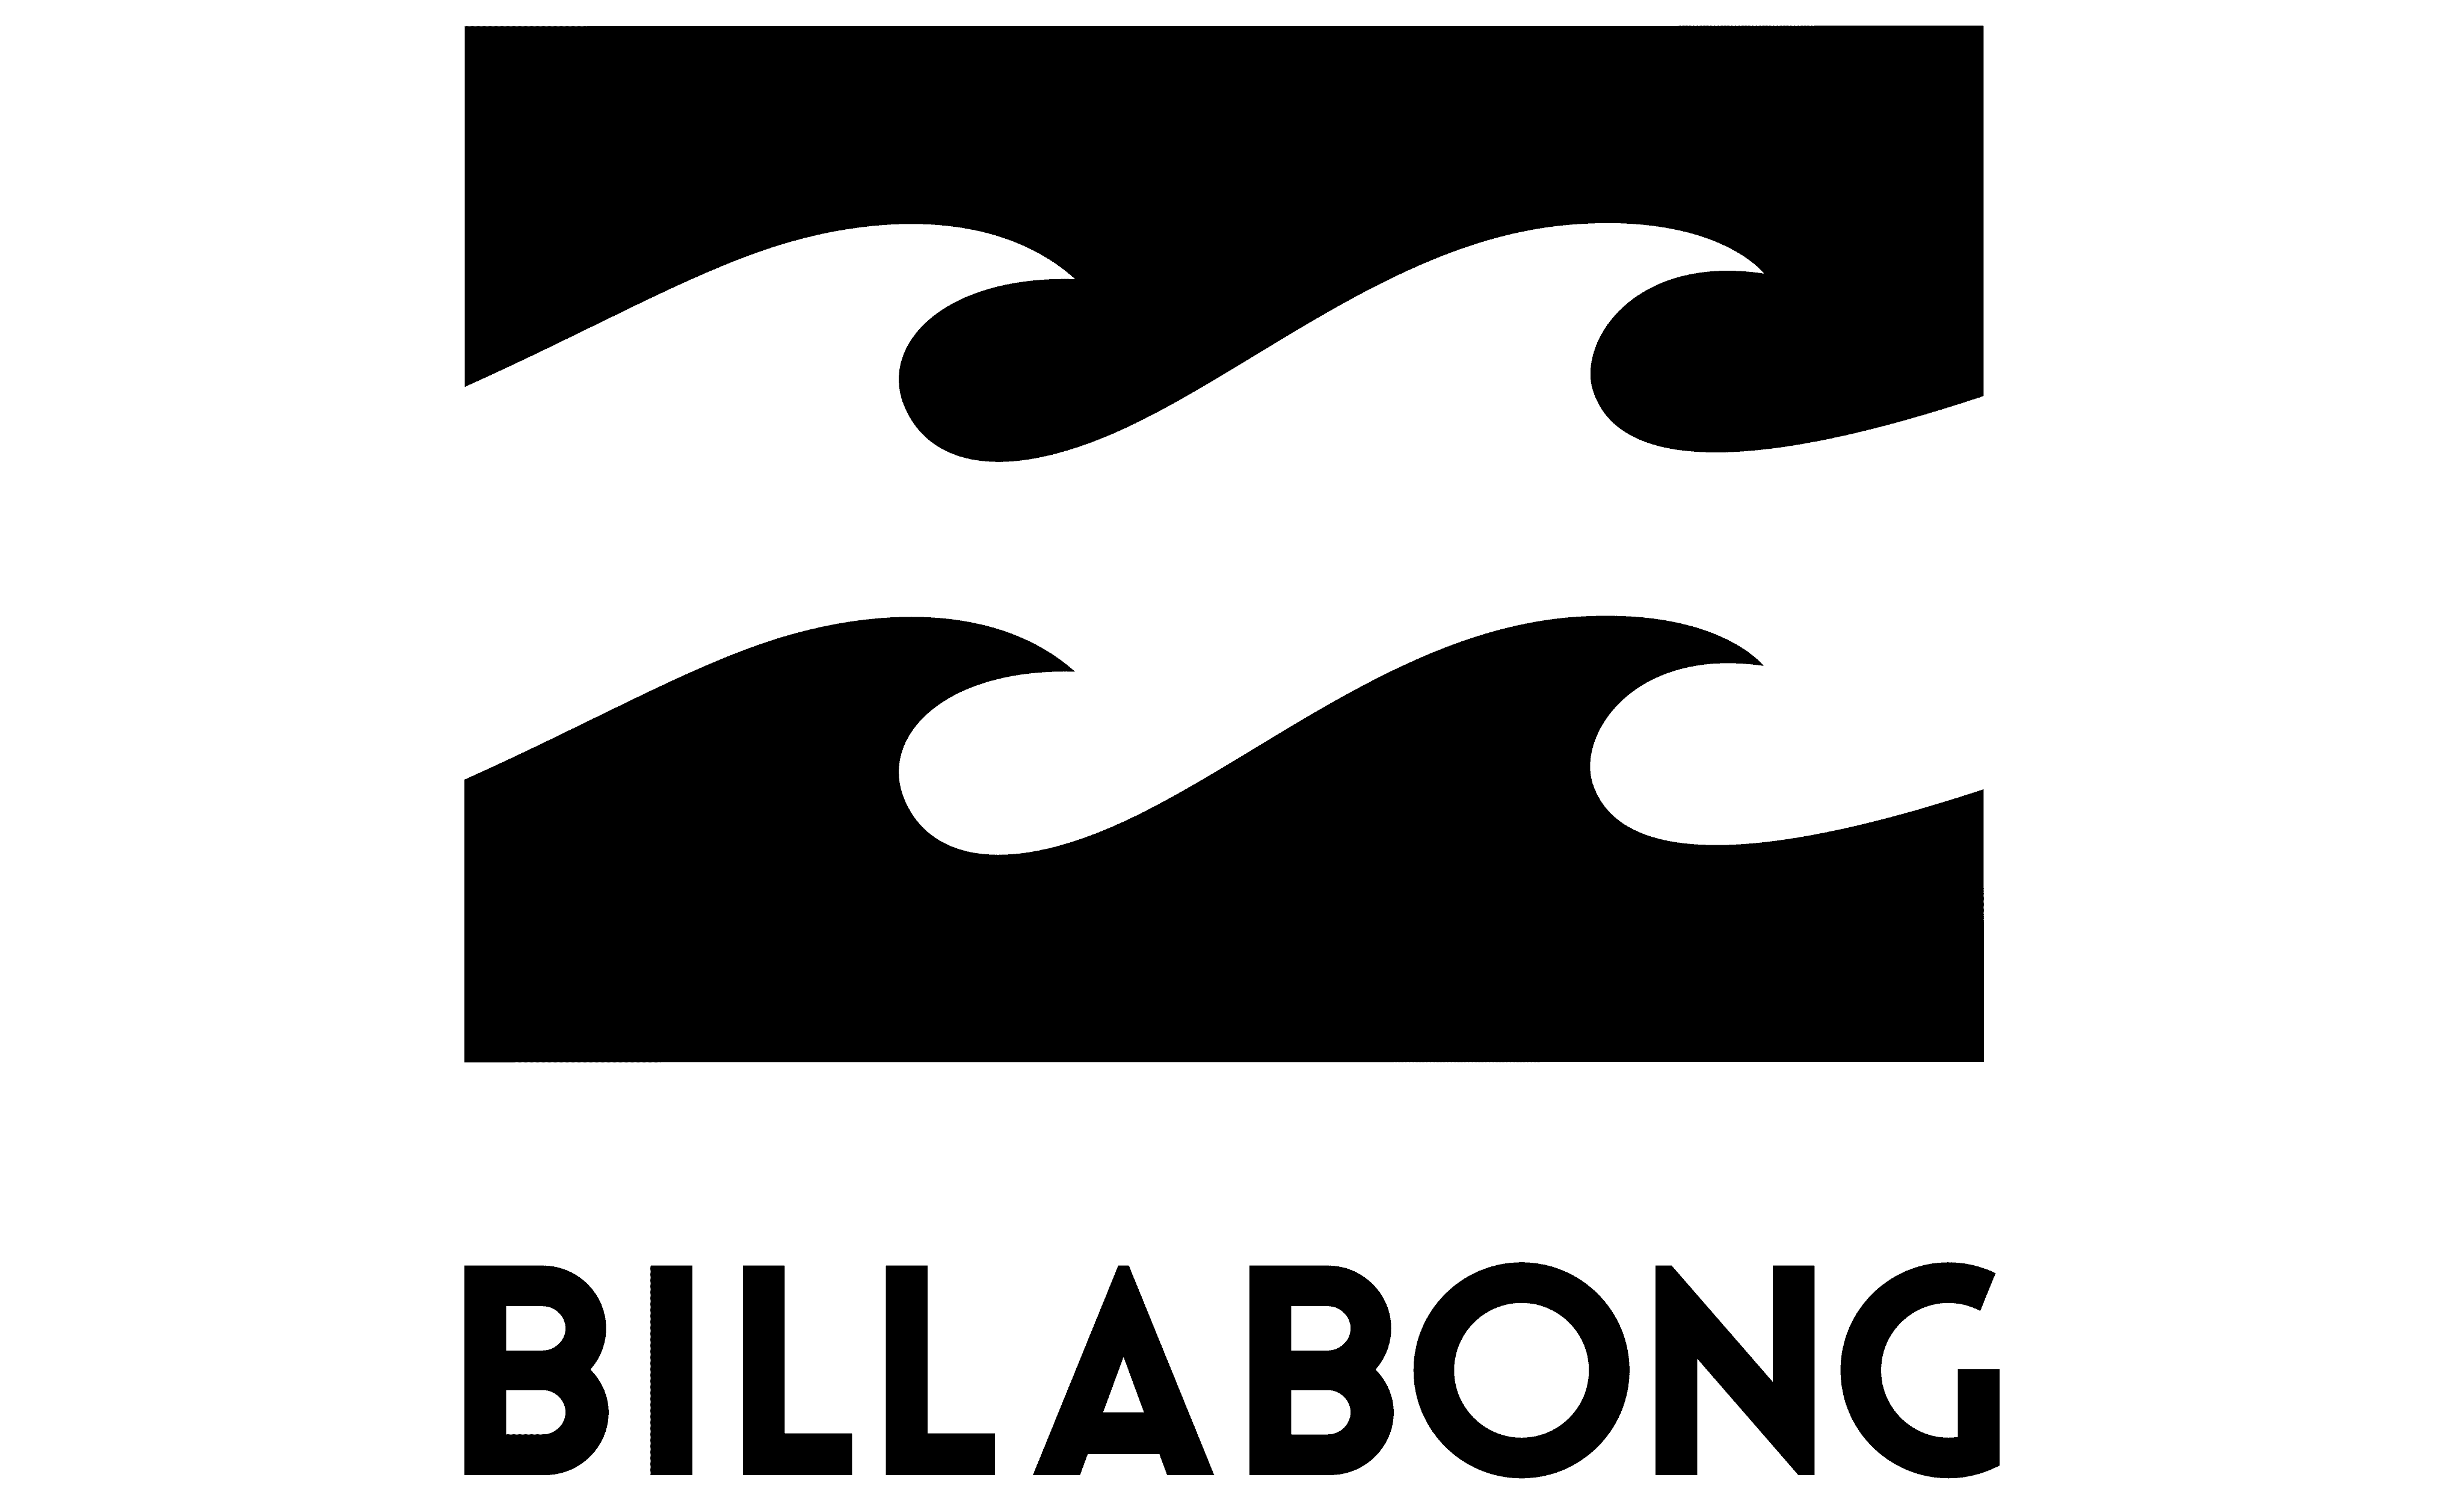 Billabong student discounts logo